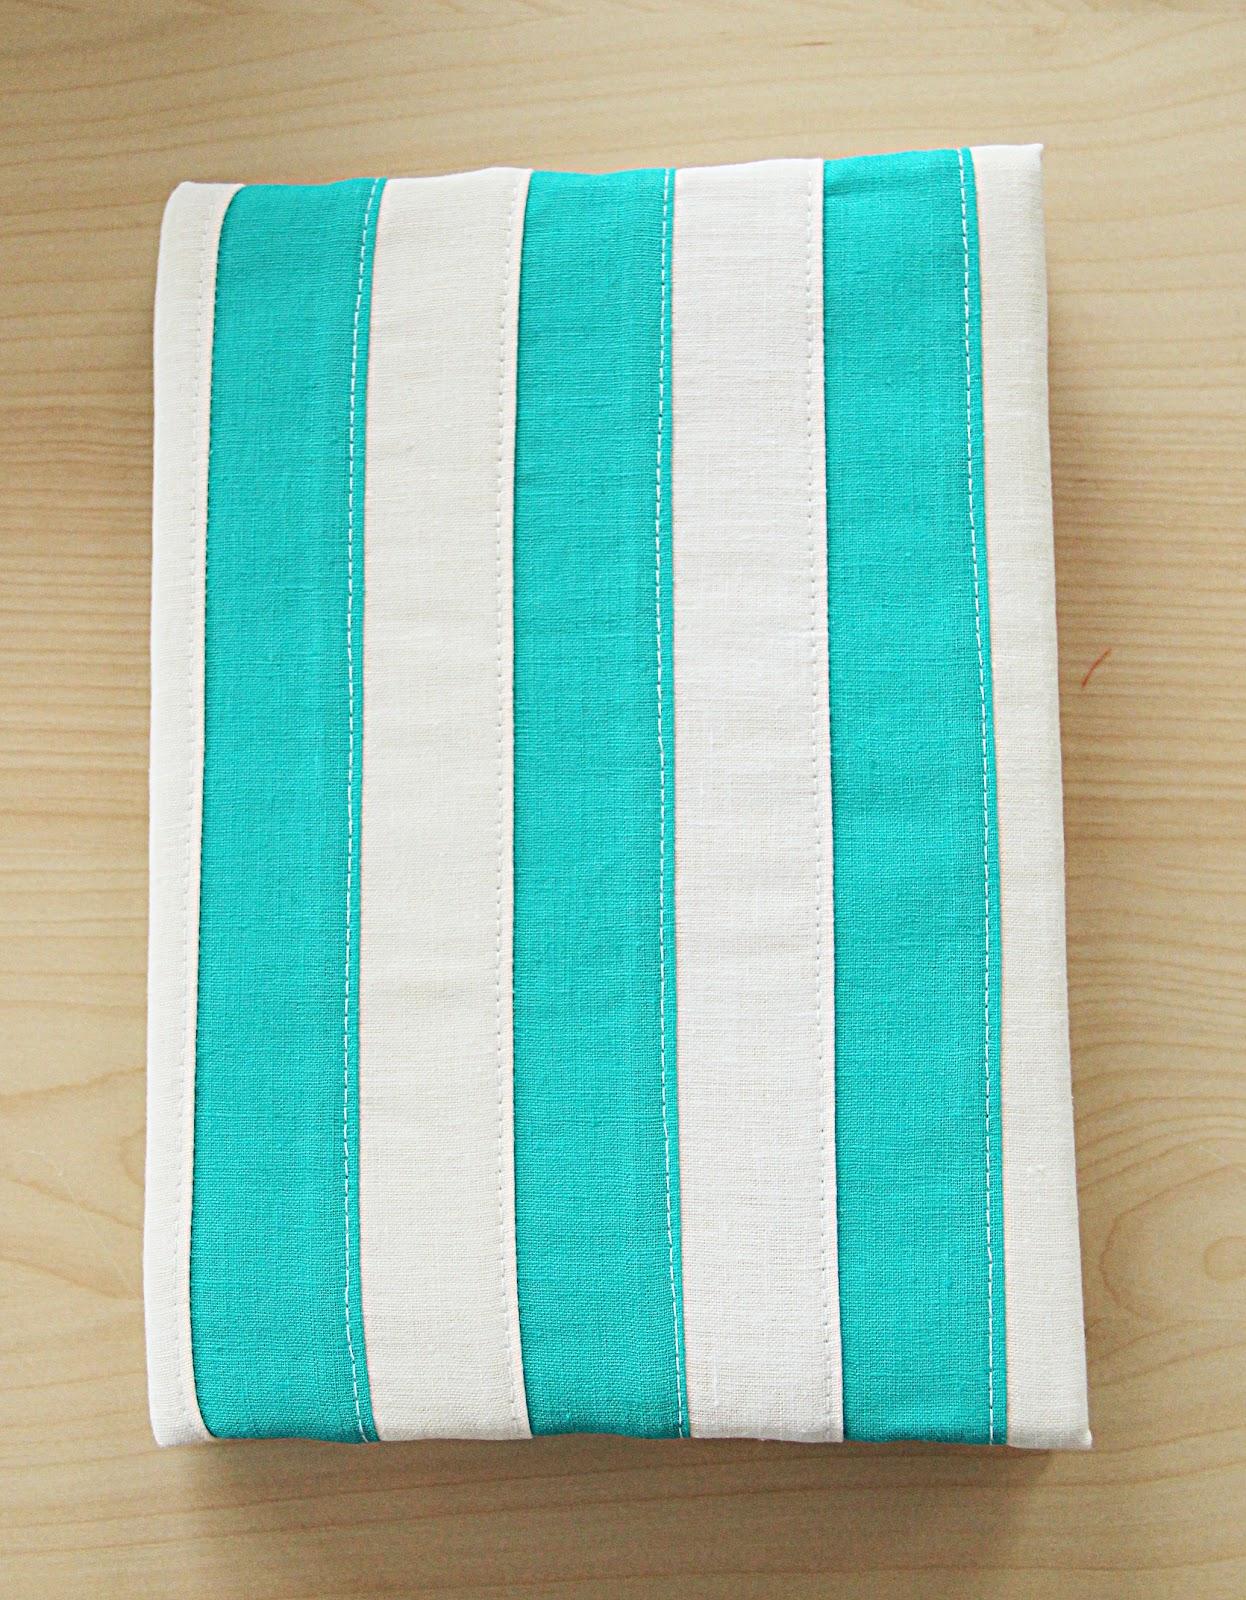 Fabric Book Cover With Zipper Tutorial ~ Zipper teeth plush hardcover sketchbook tutorial